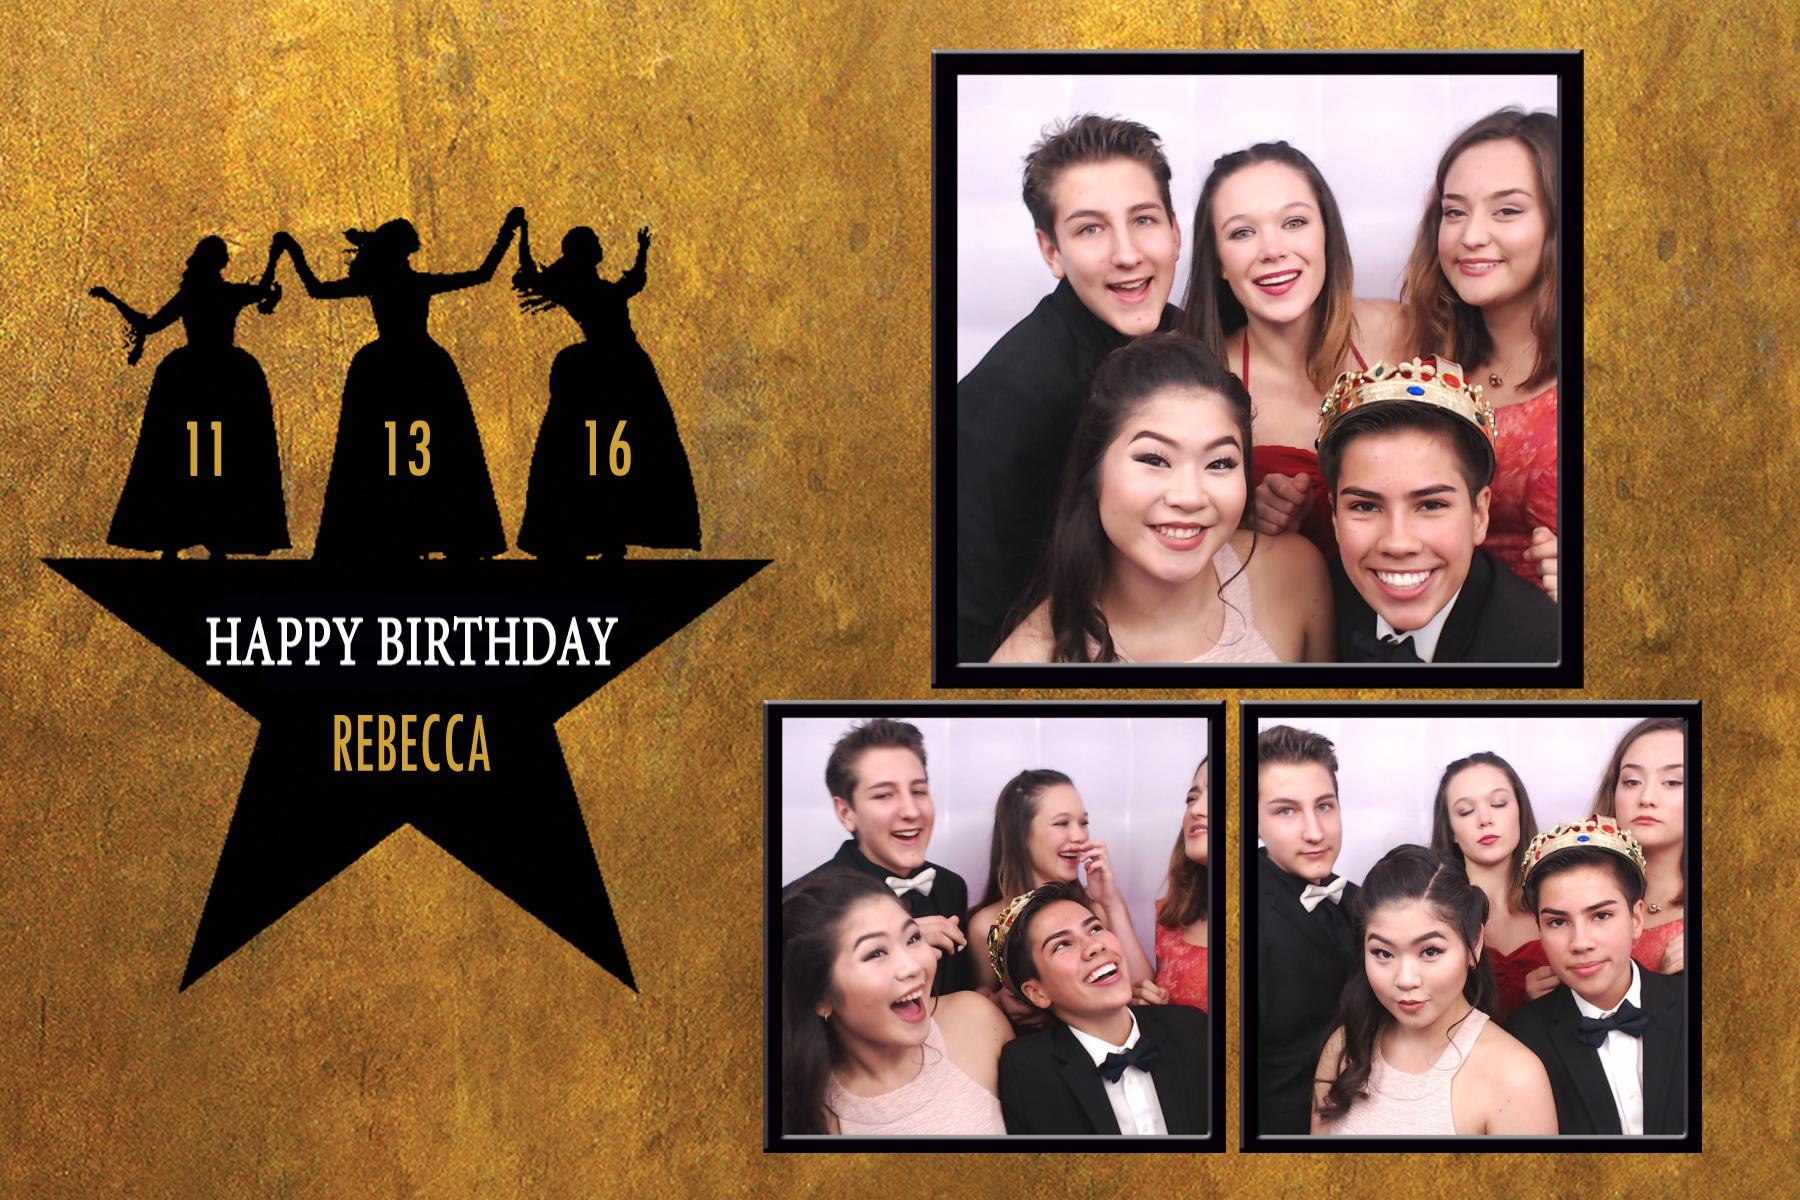 Rebecca's Birthday Party